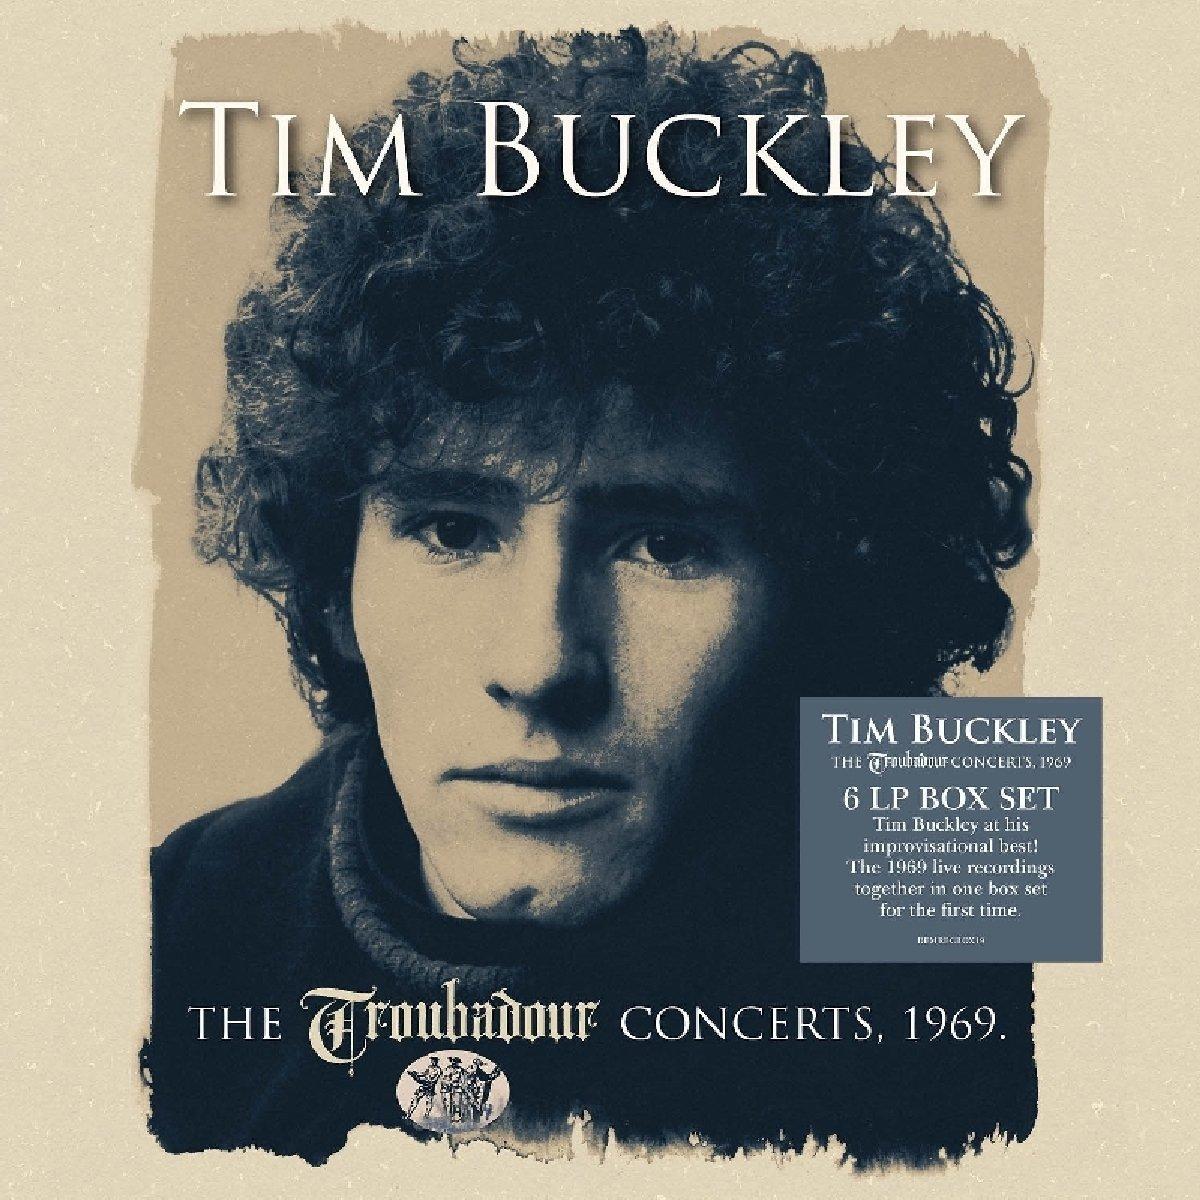 Vinilo : Tim Buckley - Troubadour Concerts (Boxed Set, United Kingdom - Import, 6PC, Oversize Item Split)